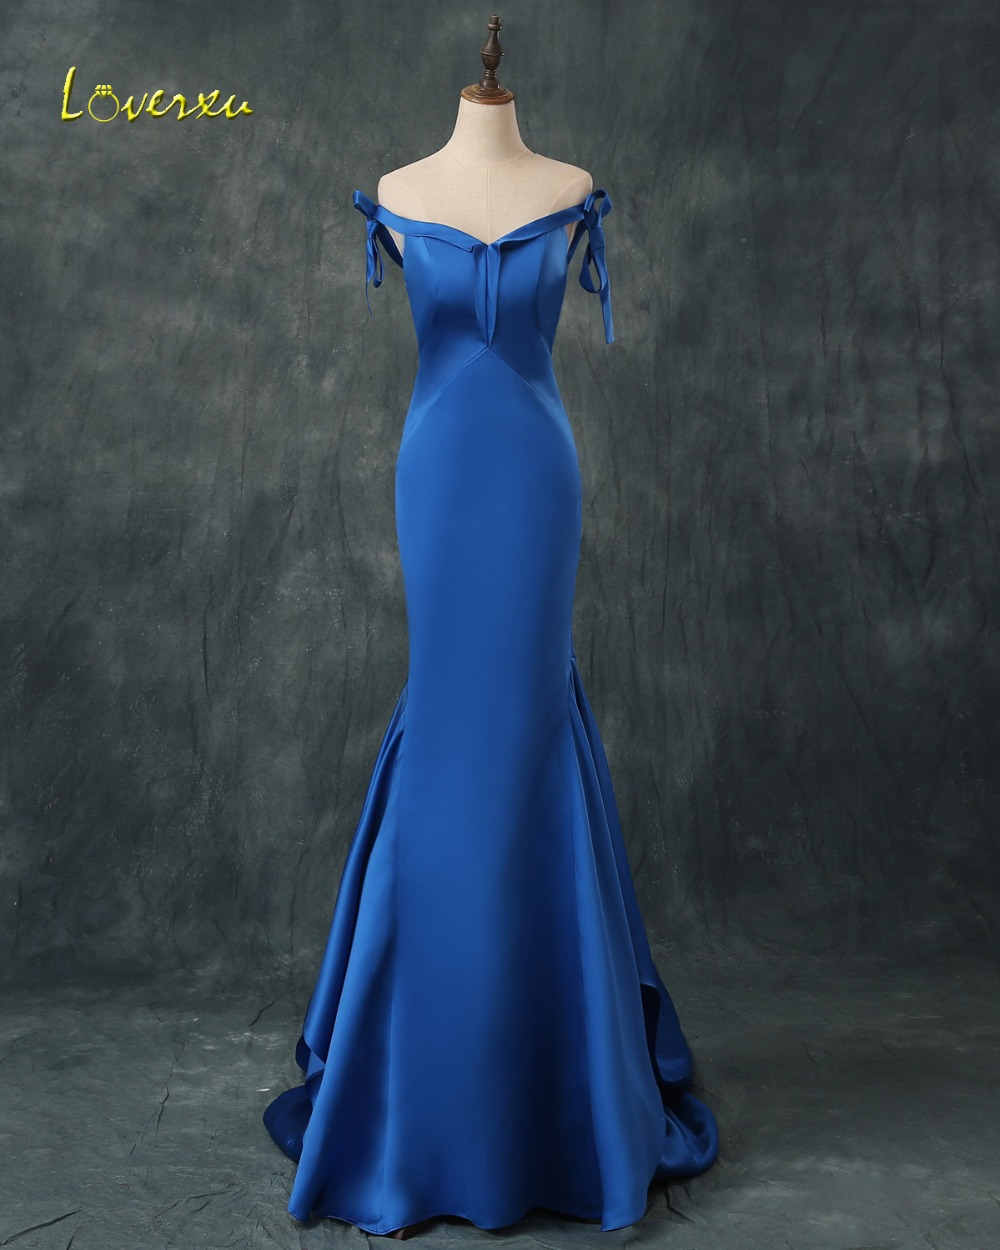 Loverxu Charming Sweetheart Lace Up Royal Blue Evening Dresses 2019 Sexy Off the Shoulder Party Gown Vestido de Festa Plus Size